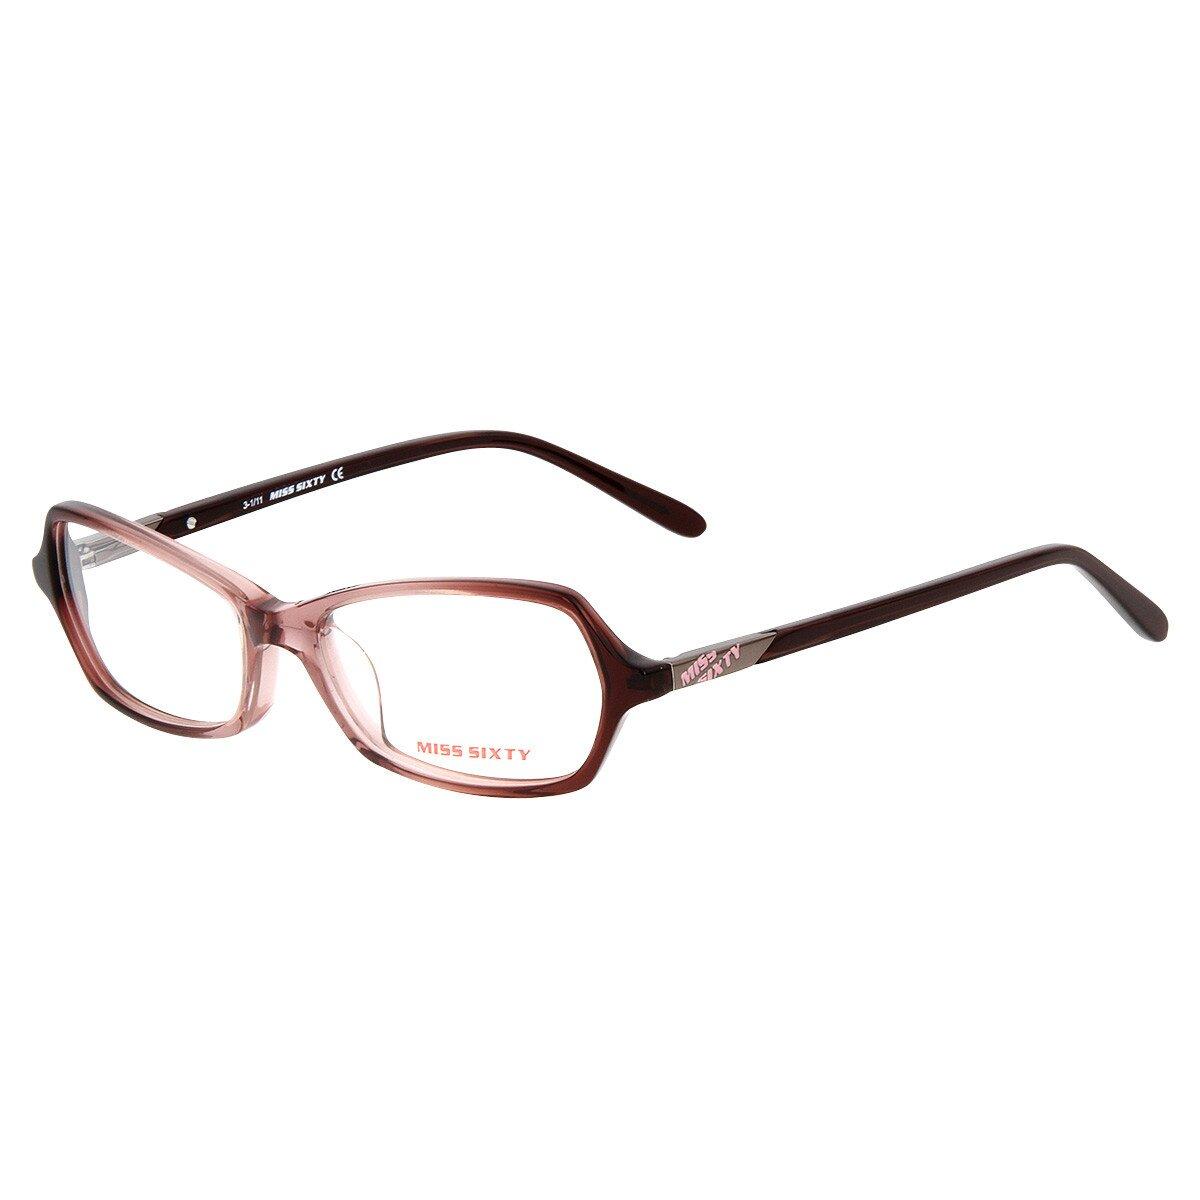 d69fb3131 Dámske retro hnedé okuliare Miss Sixty   Zlavomat.sk